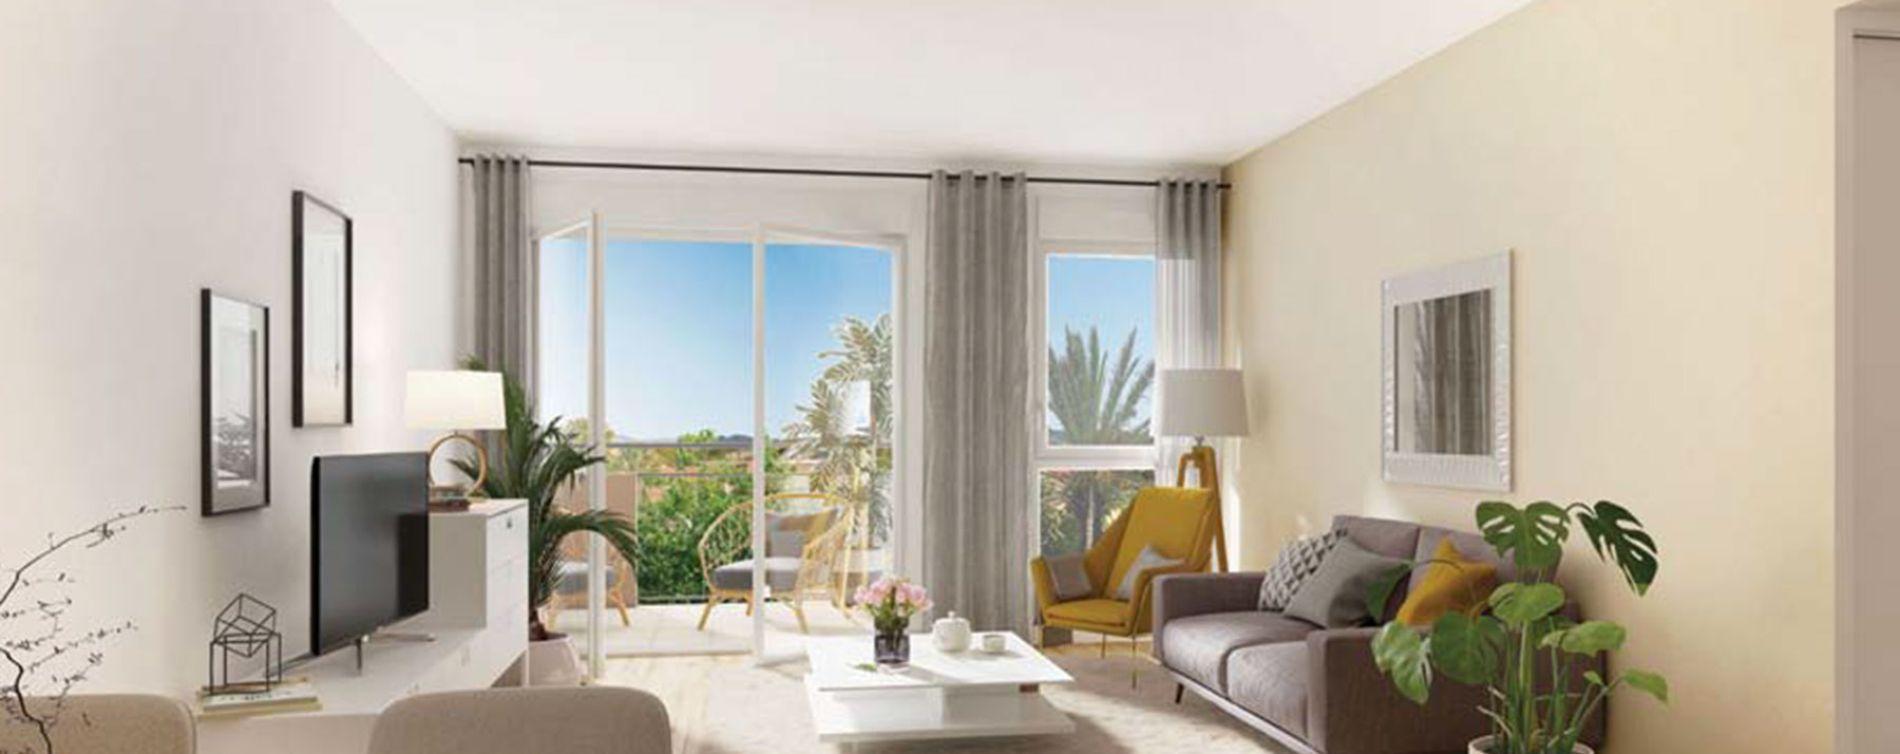 Fréjus : programme immobilier neuve « Les Balcons de la Villa Marina » (3)